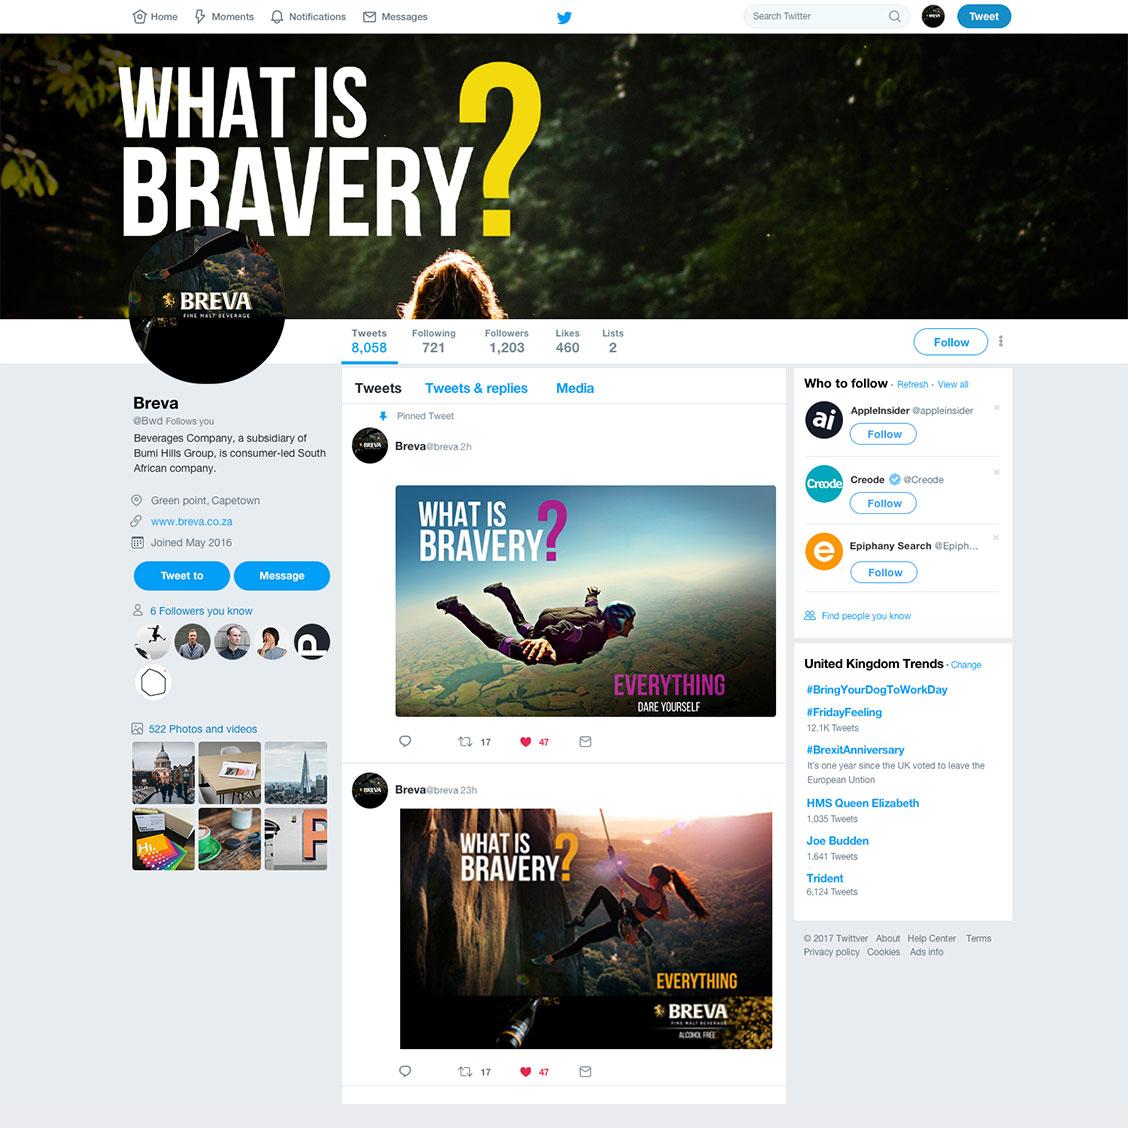 Twitter profile & post